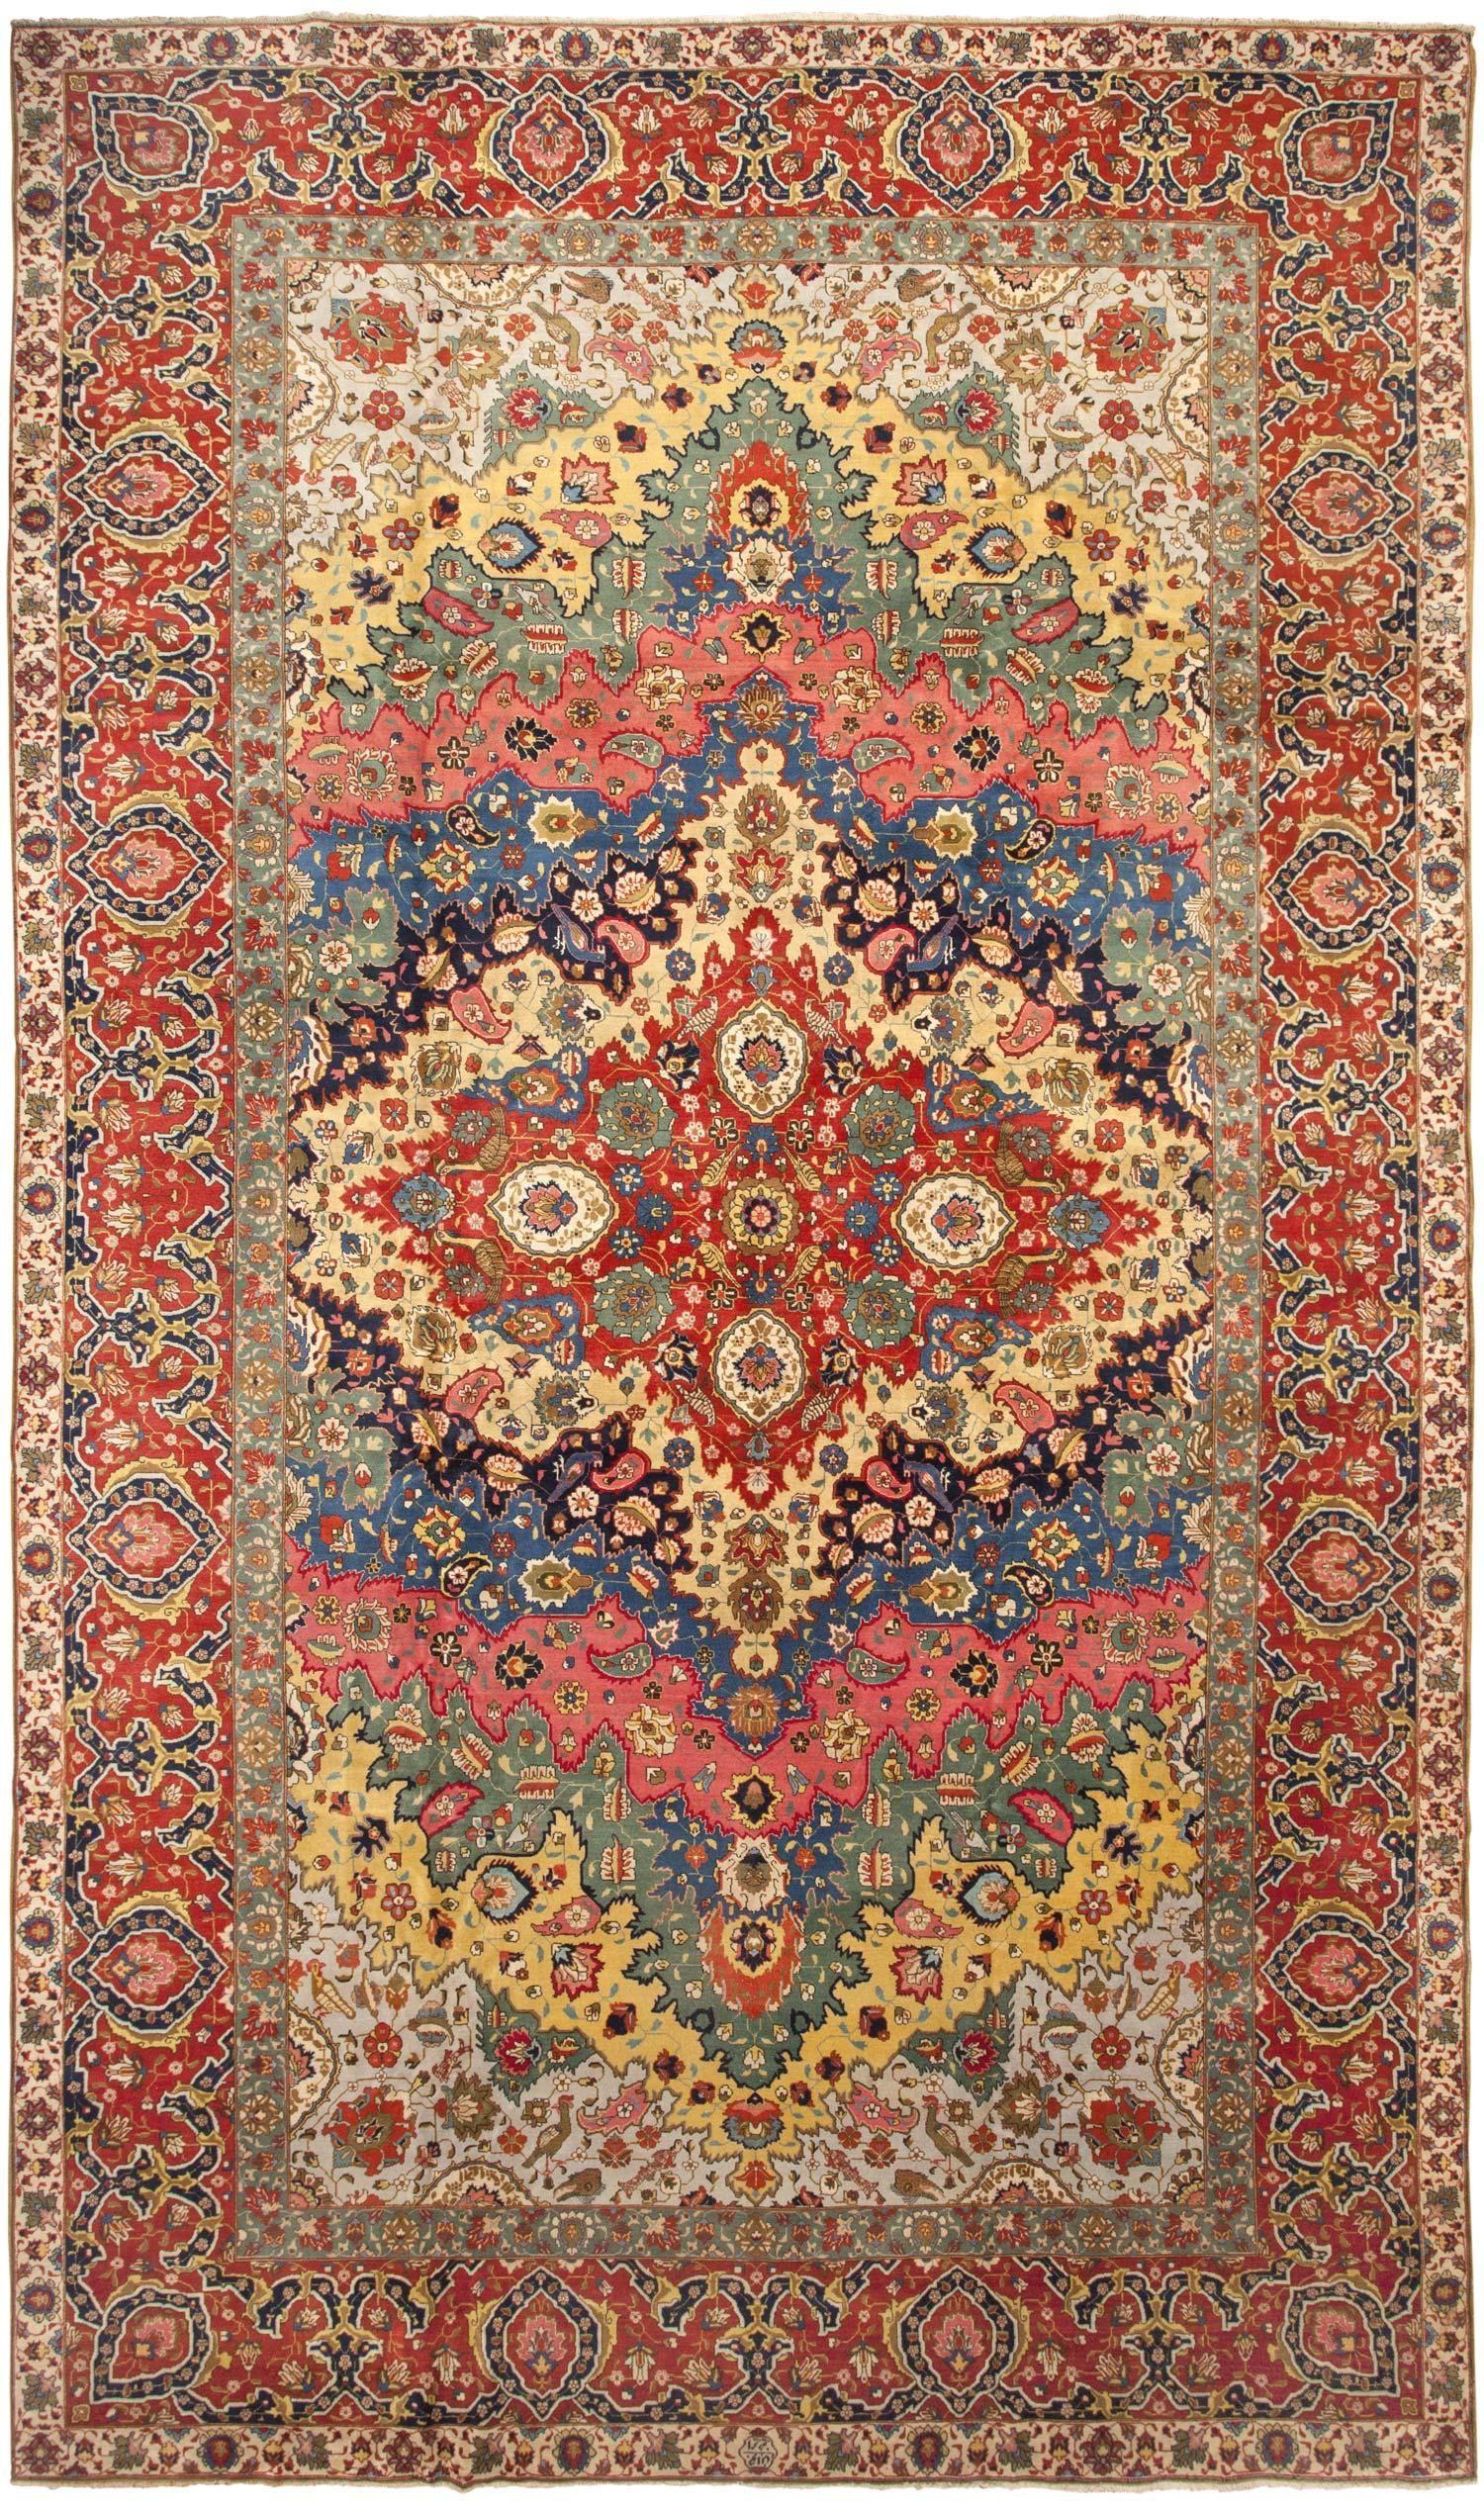 Persian Tabriz Rug Antique Persian Carpet 46383 By Nazmiyal Persian Tabriz Rug Antique Persian Carpet Tabriz Rug